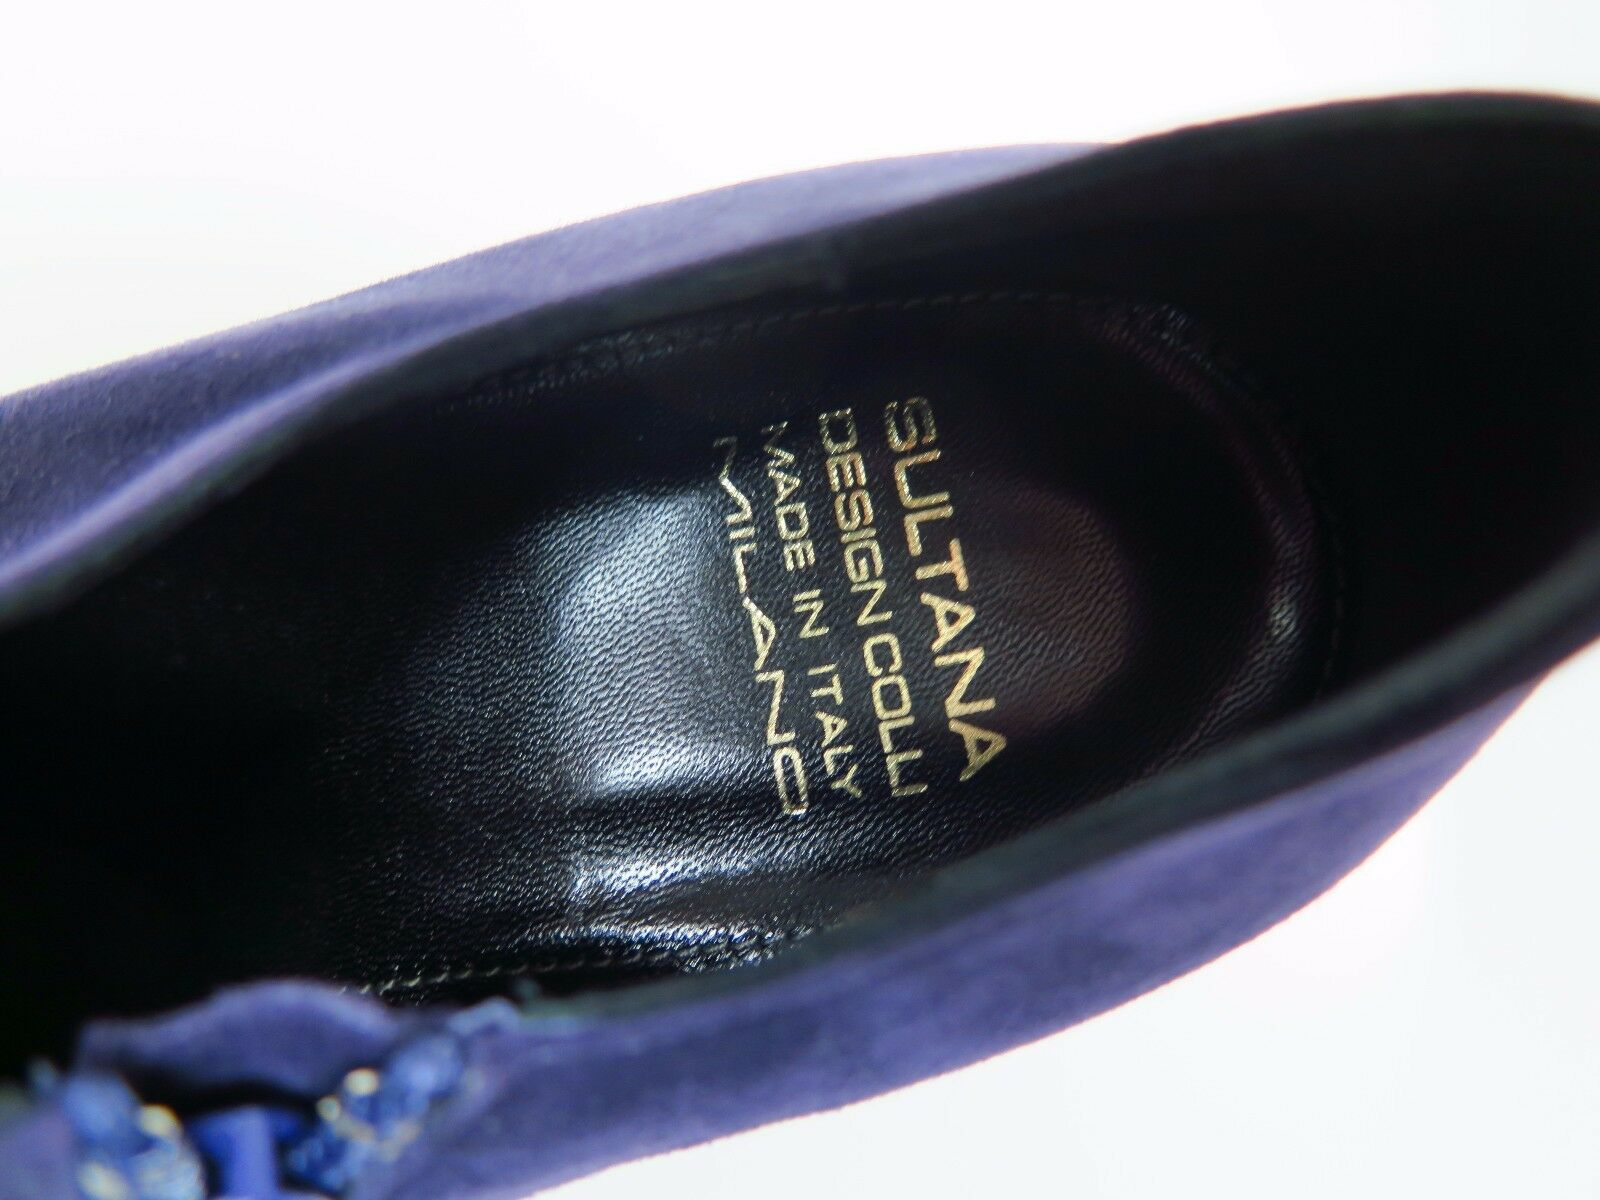 SULTANA  Damenschuhe Amber Stiefeletten Stiefel Leder N4257 Amber Damenschuhe Lila Gr. 39 NEU 0ef368